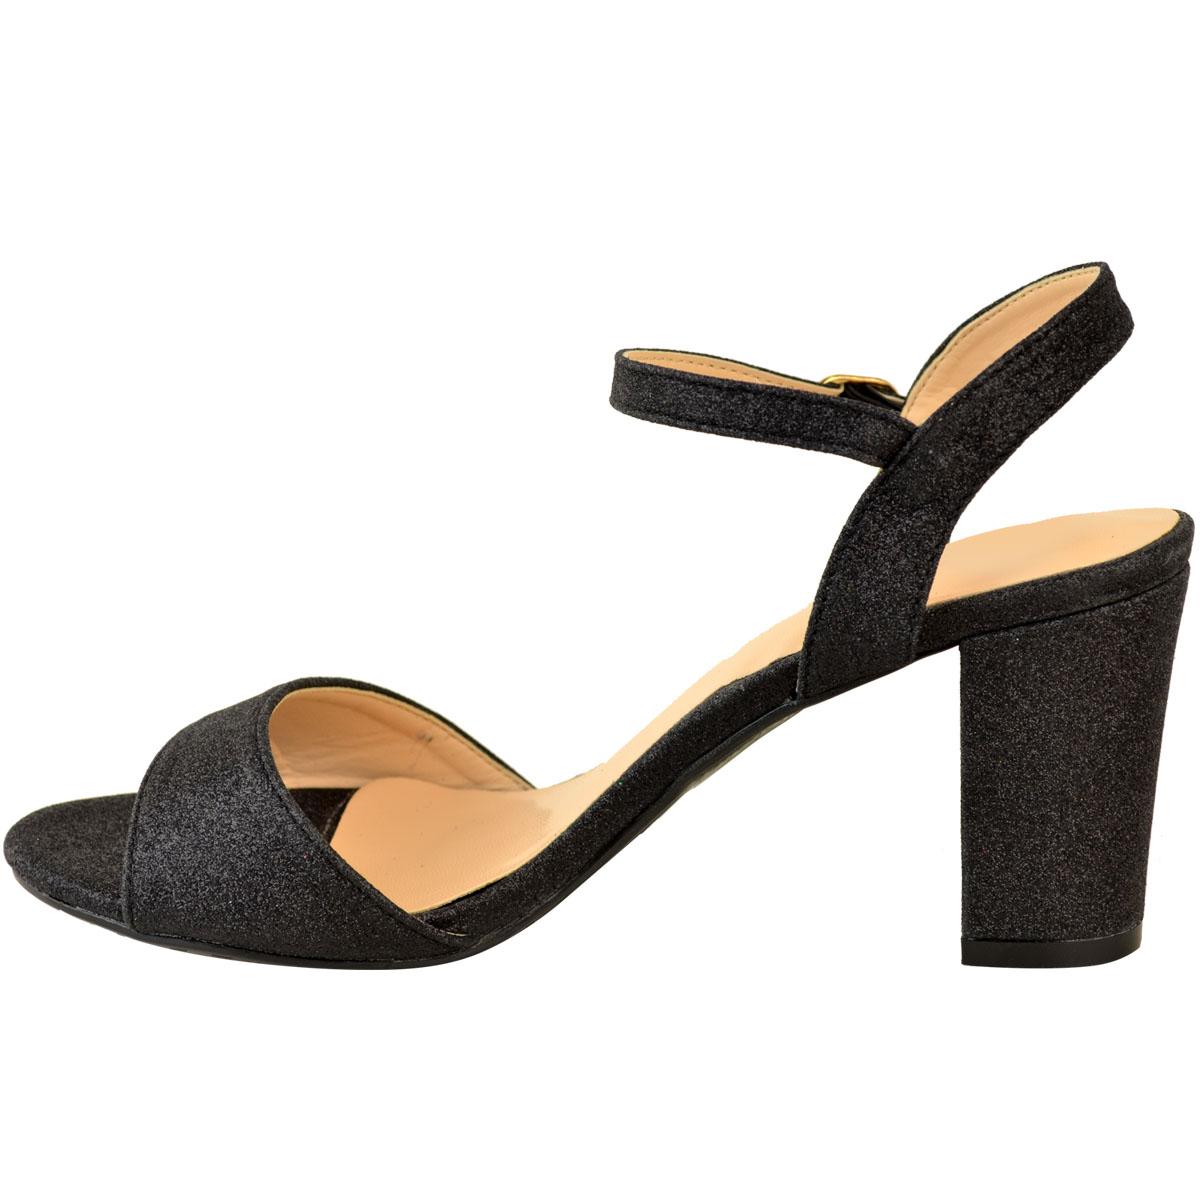 Ladies-Womens-Low-Block-Heel-Party-Bridal-Glitter-Sandals-Wedding-Prom-Shoes-Sz